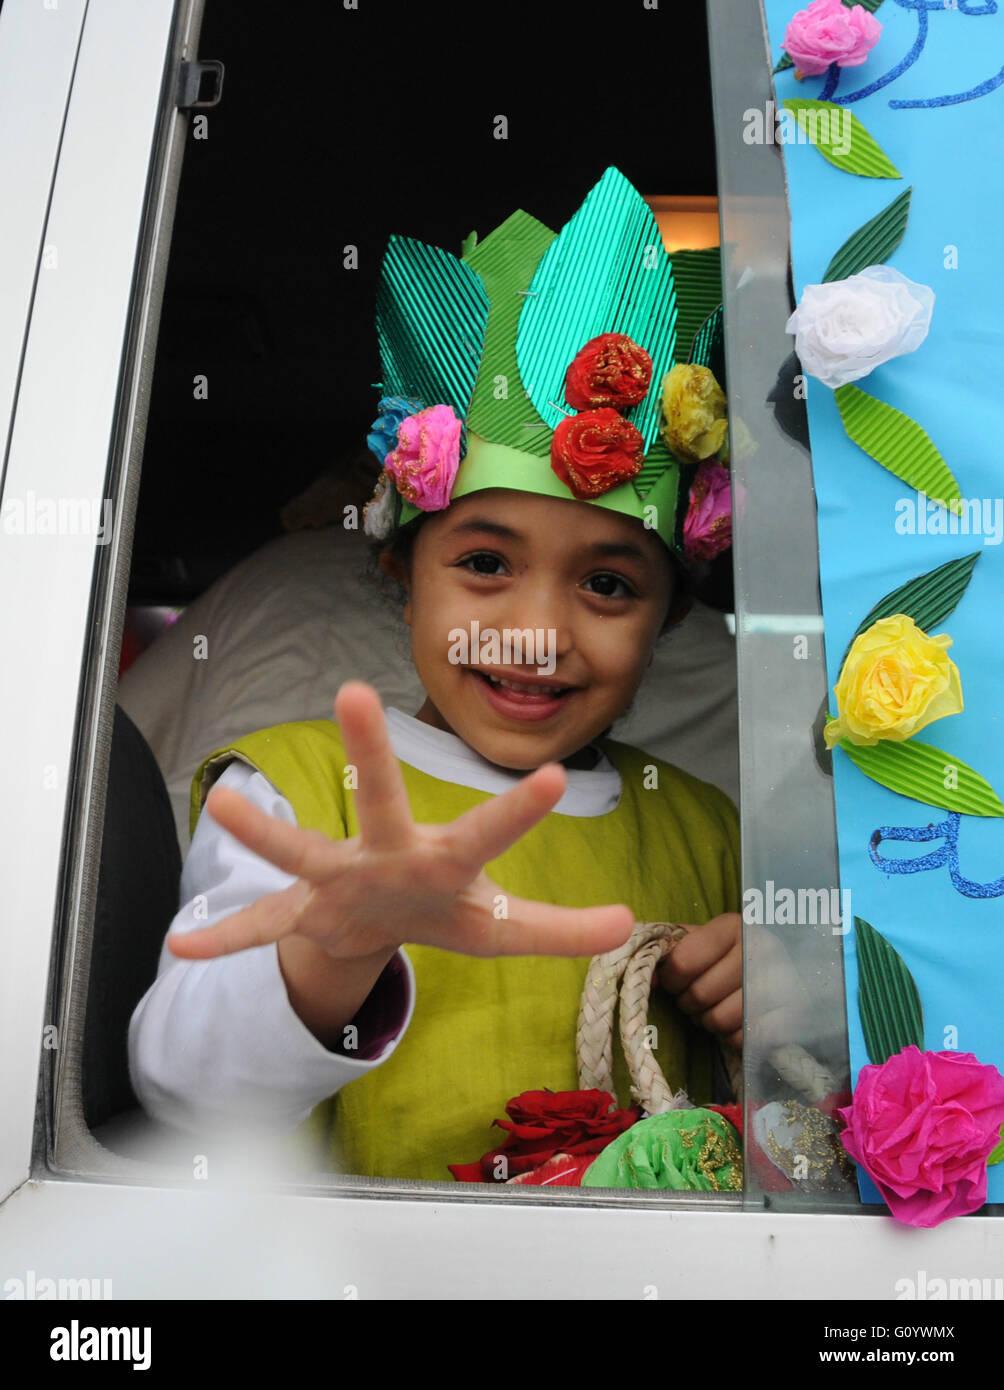 1954a313dc7e Tunis. 6 mai, 2016. Une jeune fille Tunisienne participe à la 20e Rose